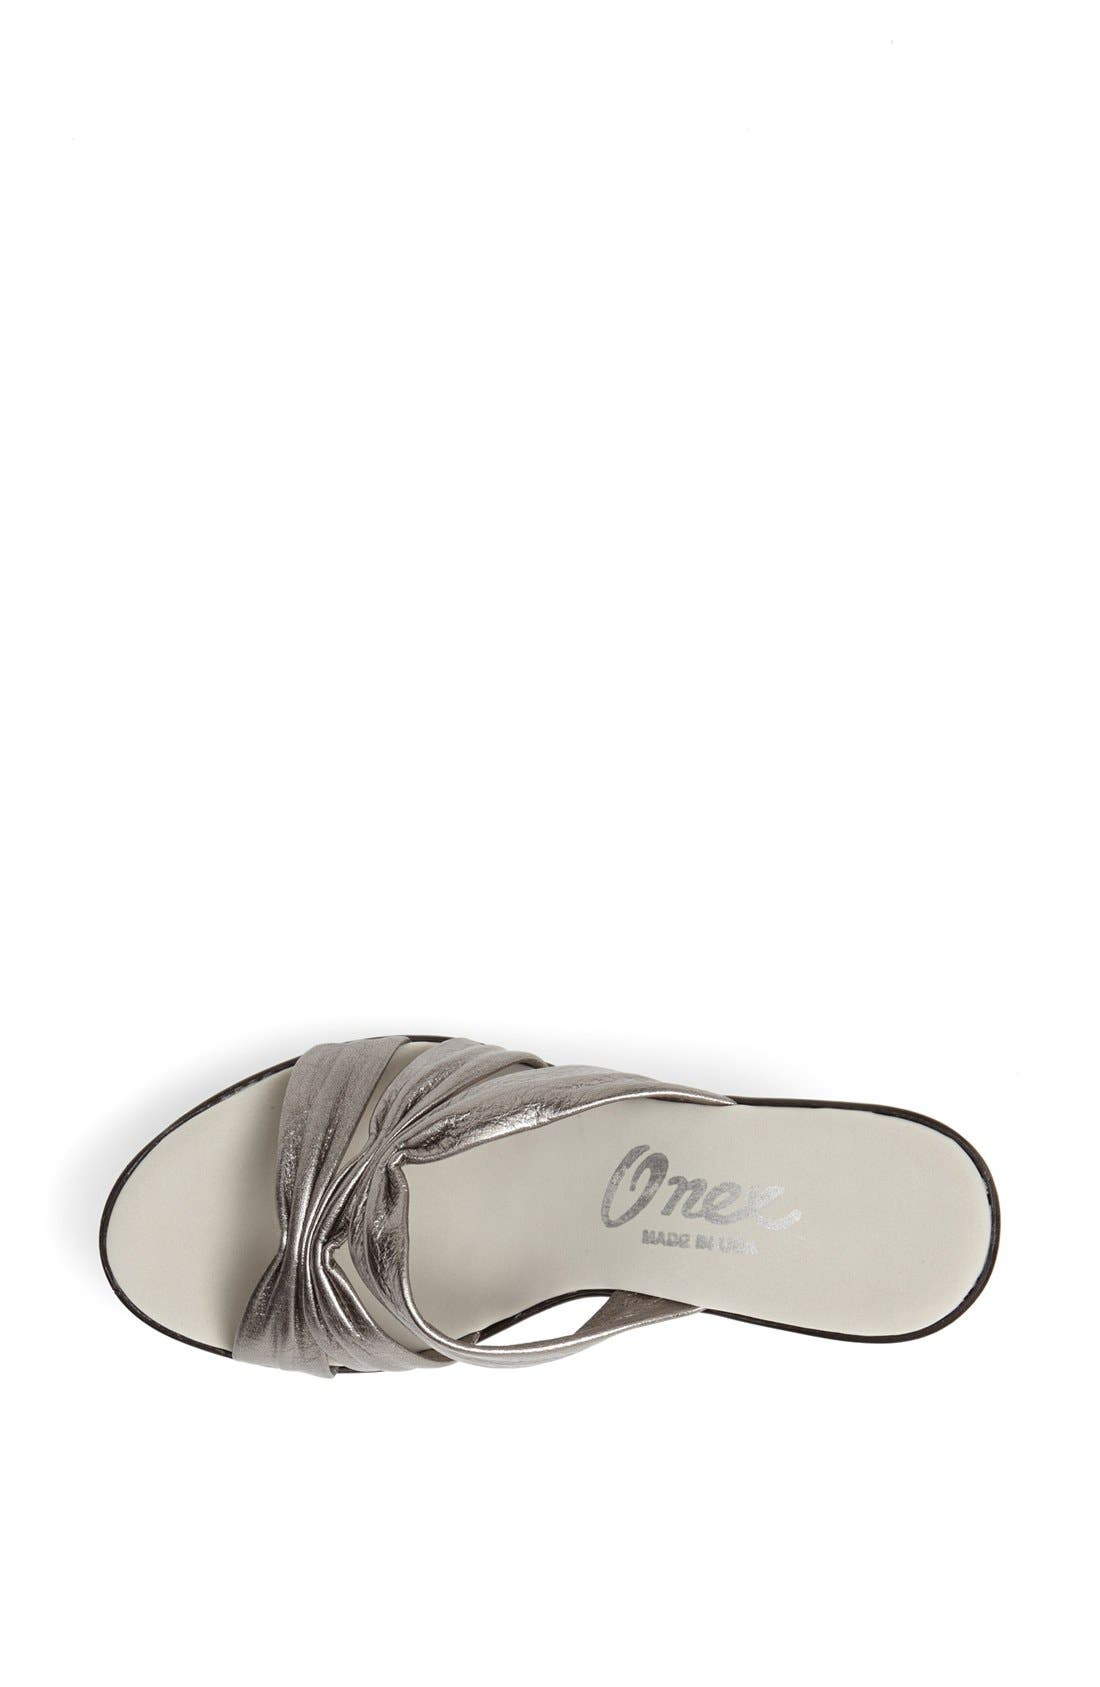 Alternate Image 3  - Onex 'Felicity' Wedge Sandal